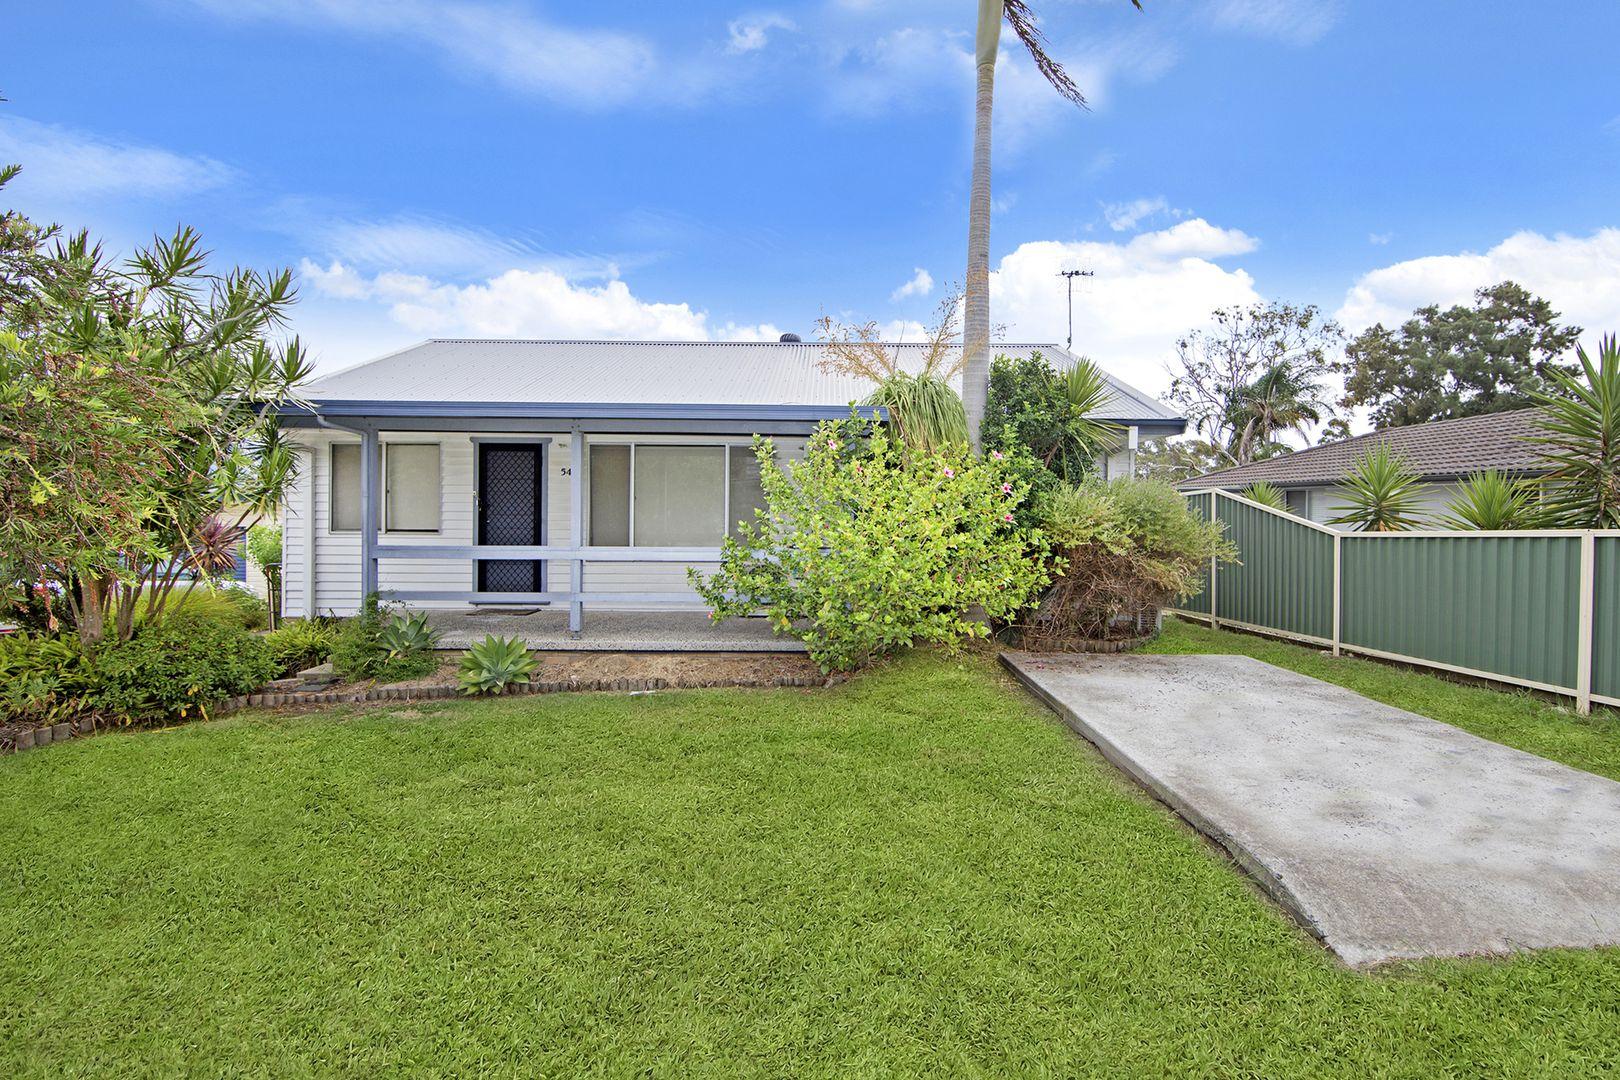 54 Springall Avenue, Wyongah NSW 2259, Image 0